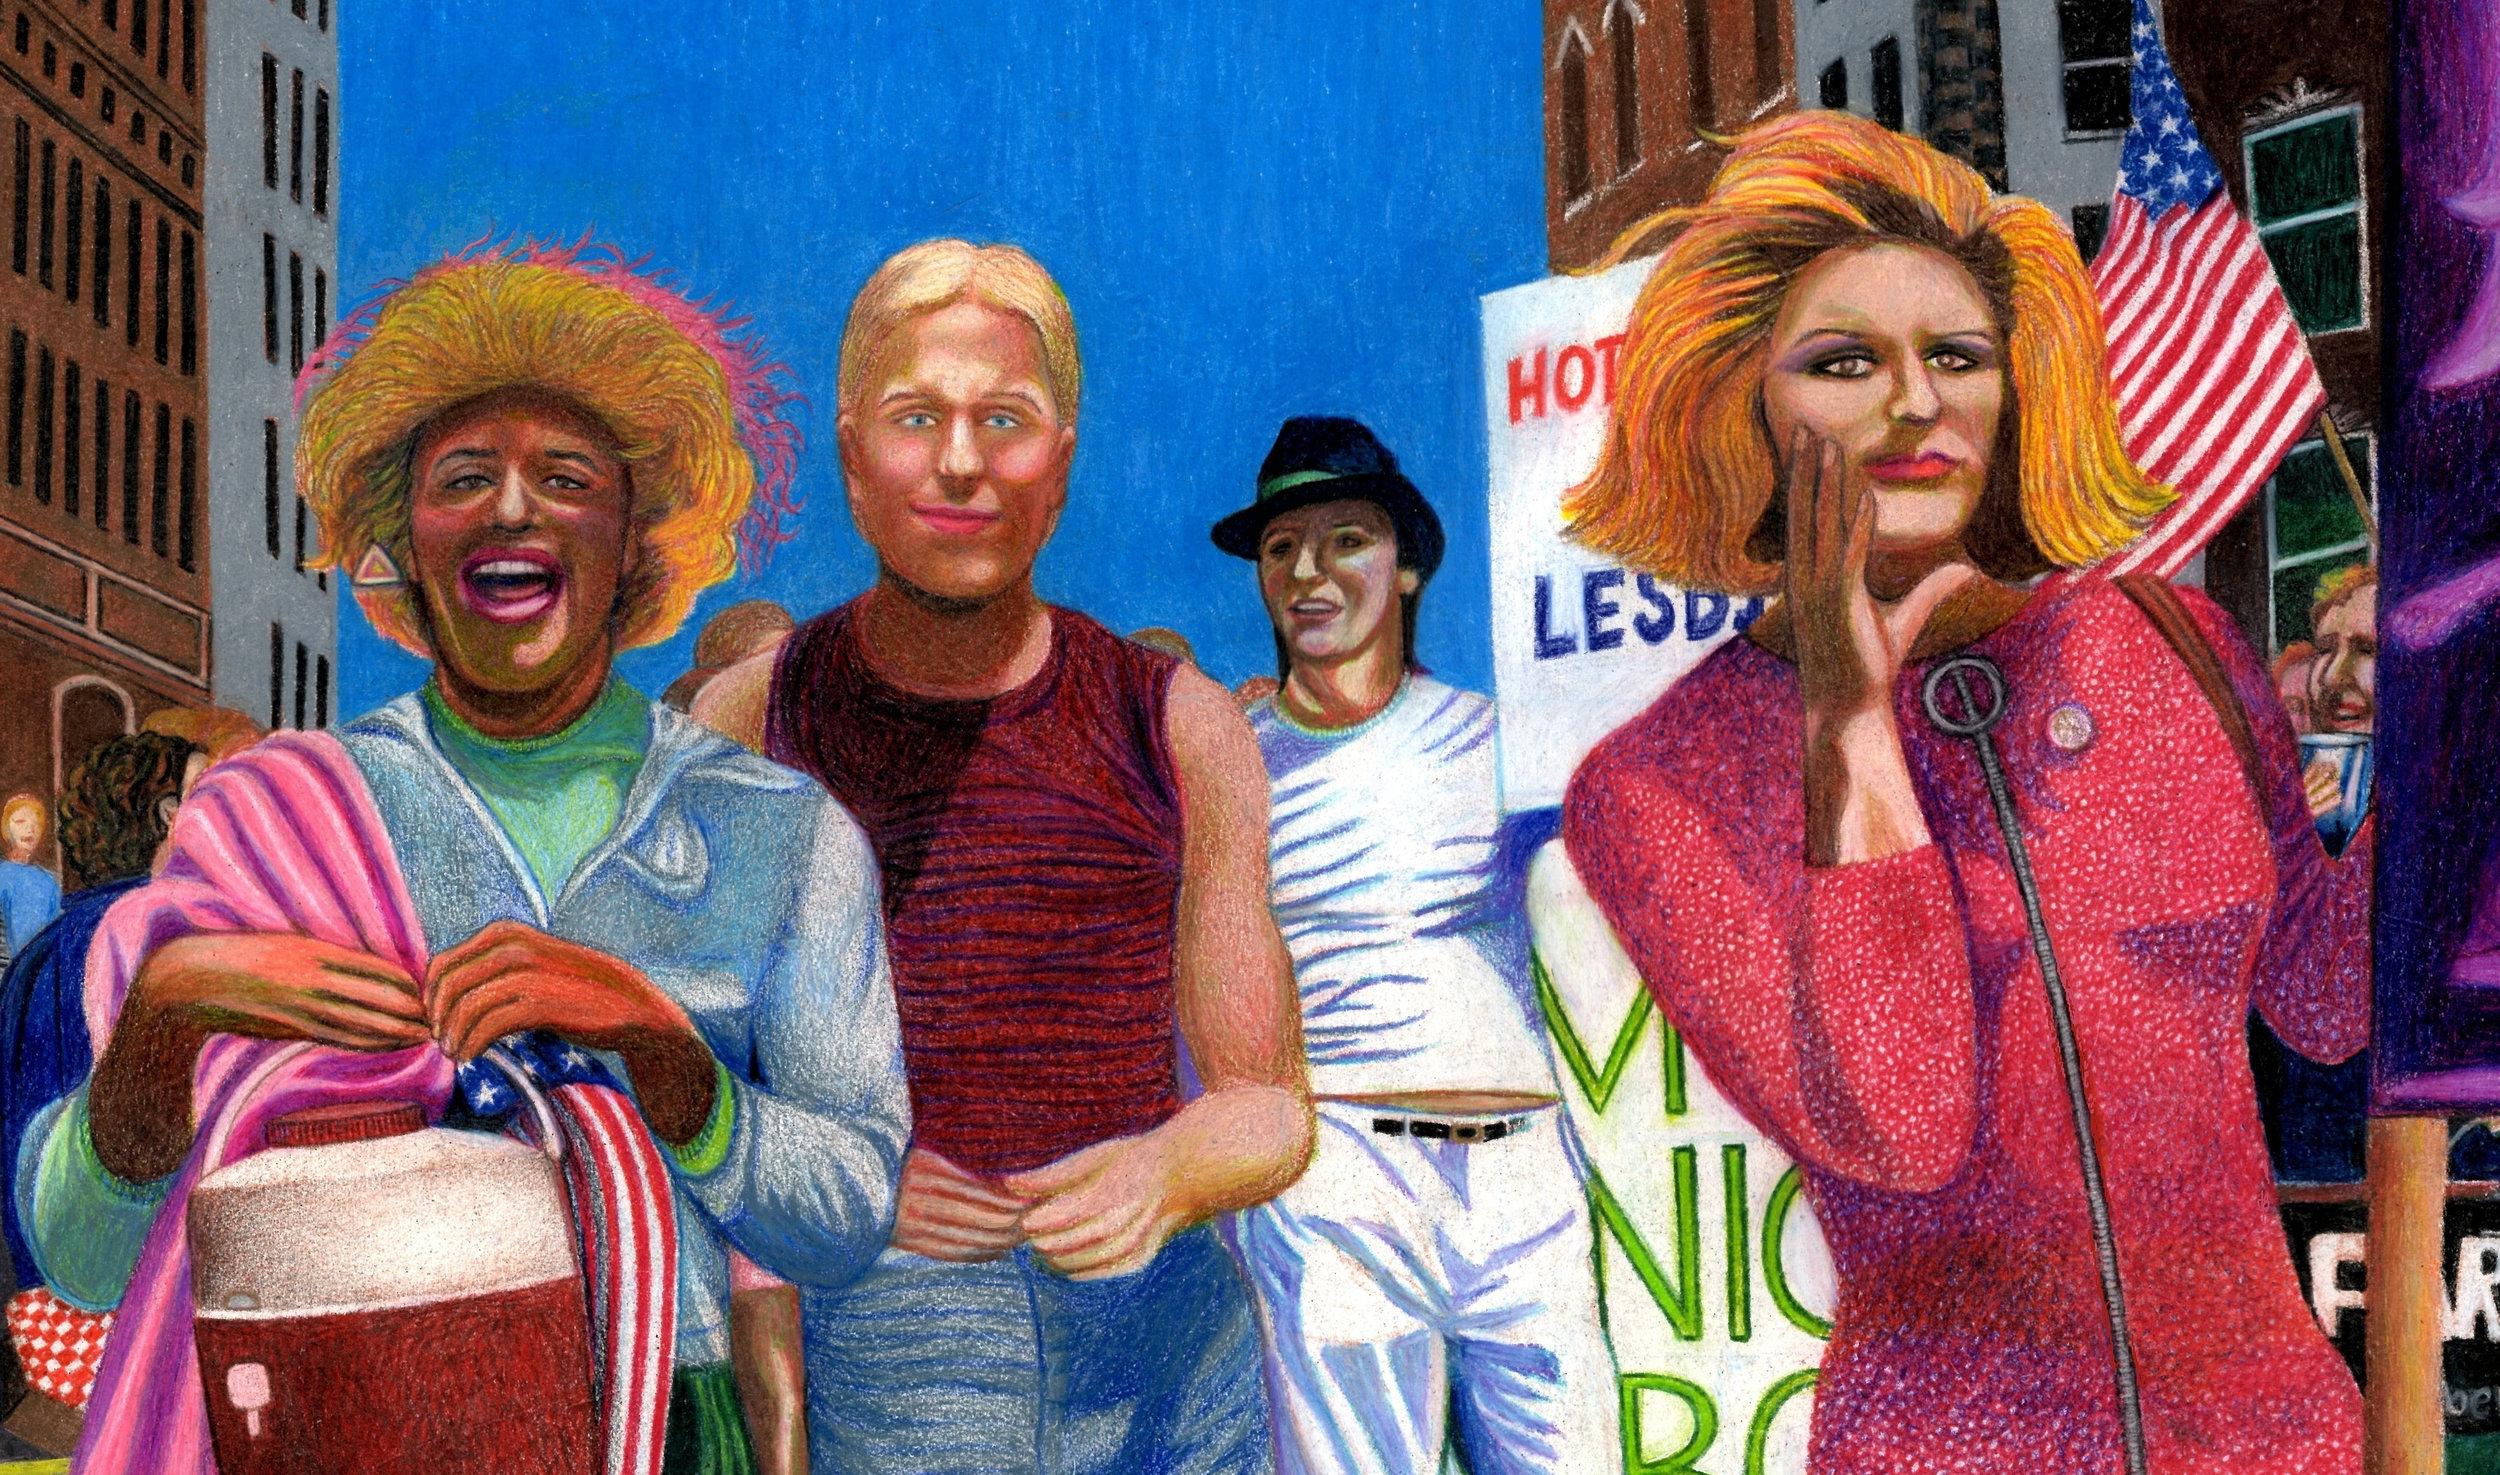 Marsha_P._Johnson,_Joseph_Ratanski_and_Sylvia_Rivera_in_the_1973_NYC_Gay_Pride_Parade_by_Gary_LeGault.jpg